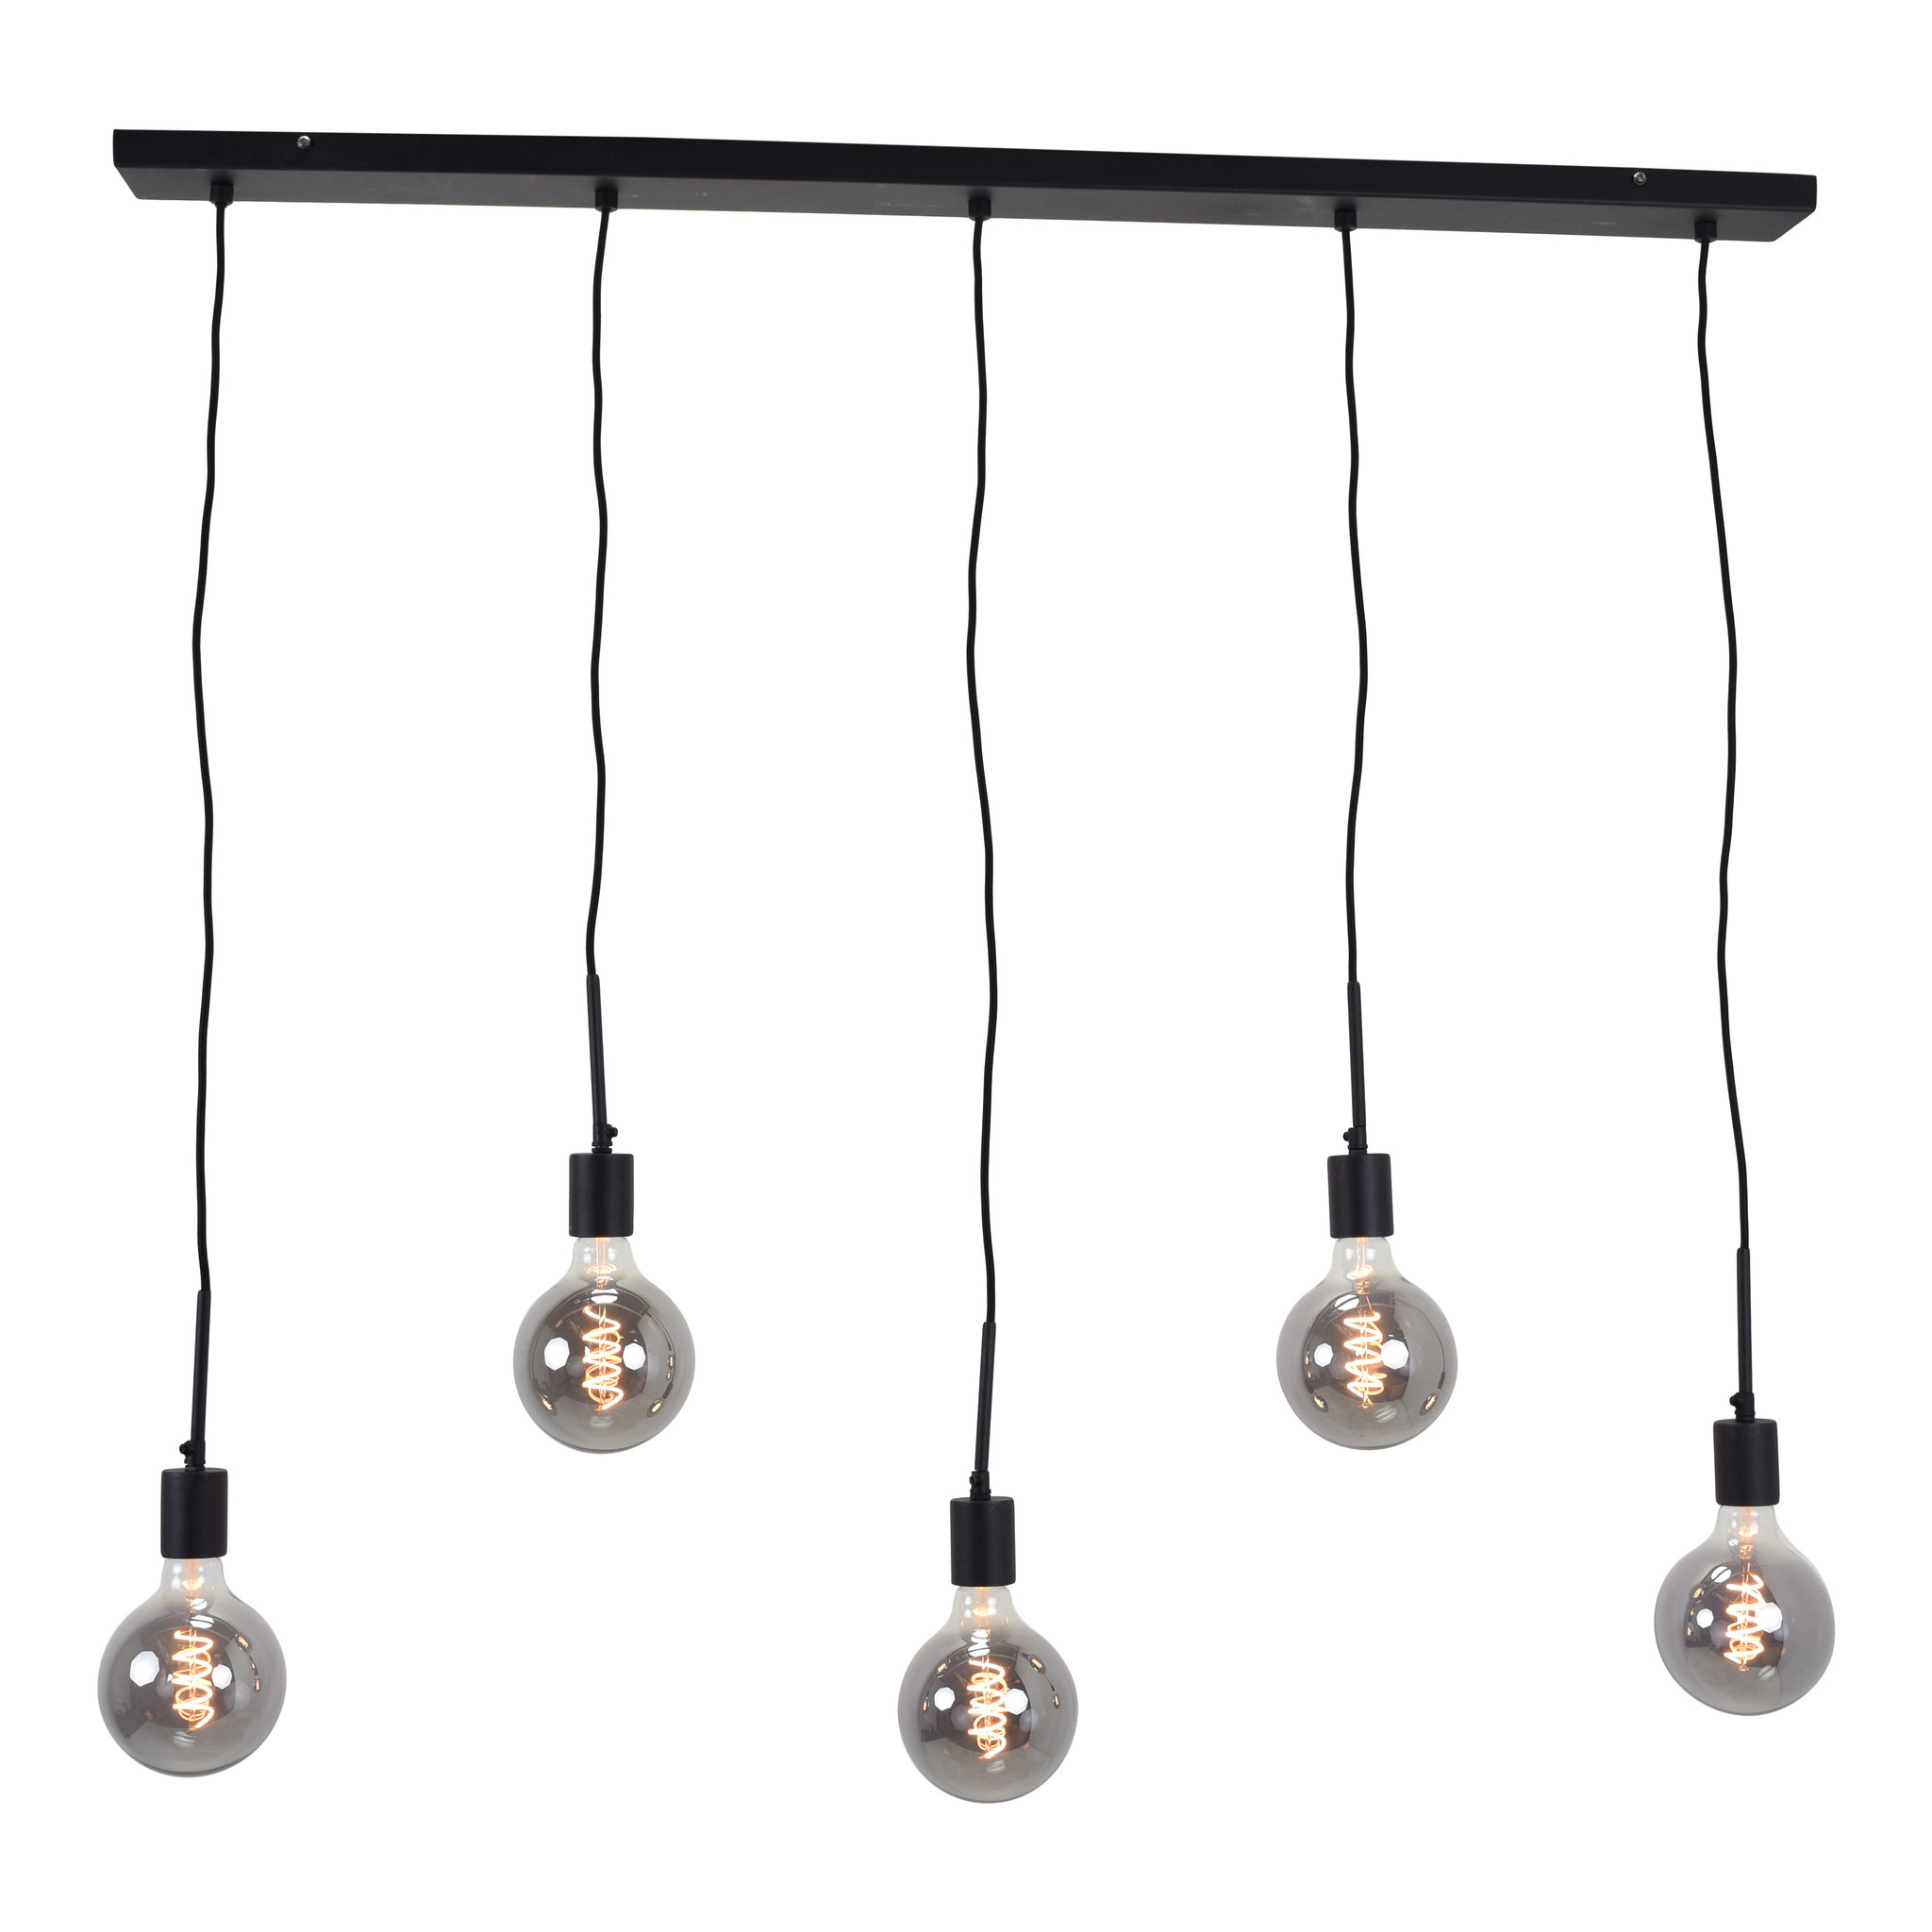 Urban Interiors Urban Interiors Hanglamp Bulby 5-lichts Zwart-AI-CL-2200-5-8719325467192